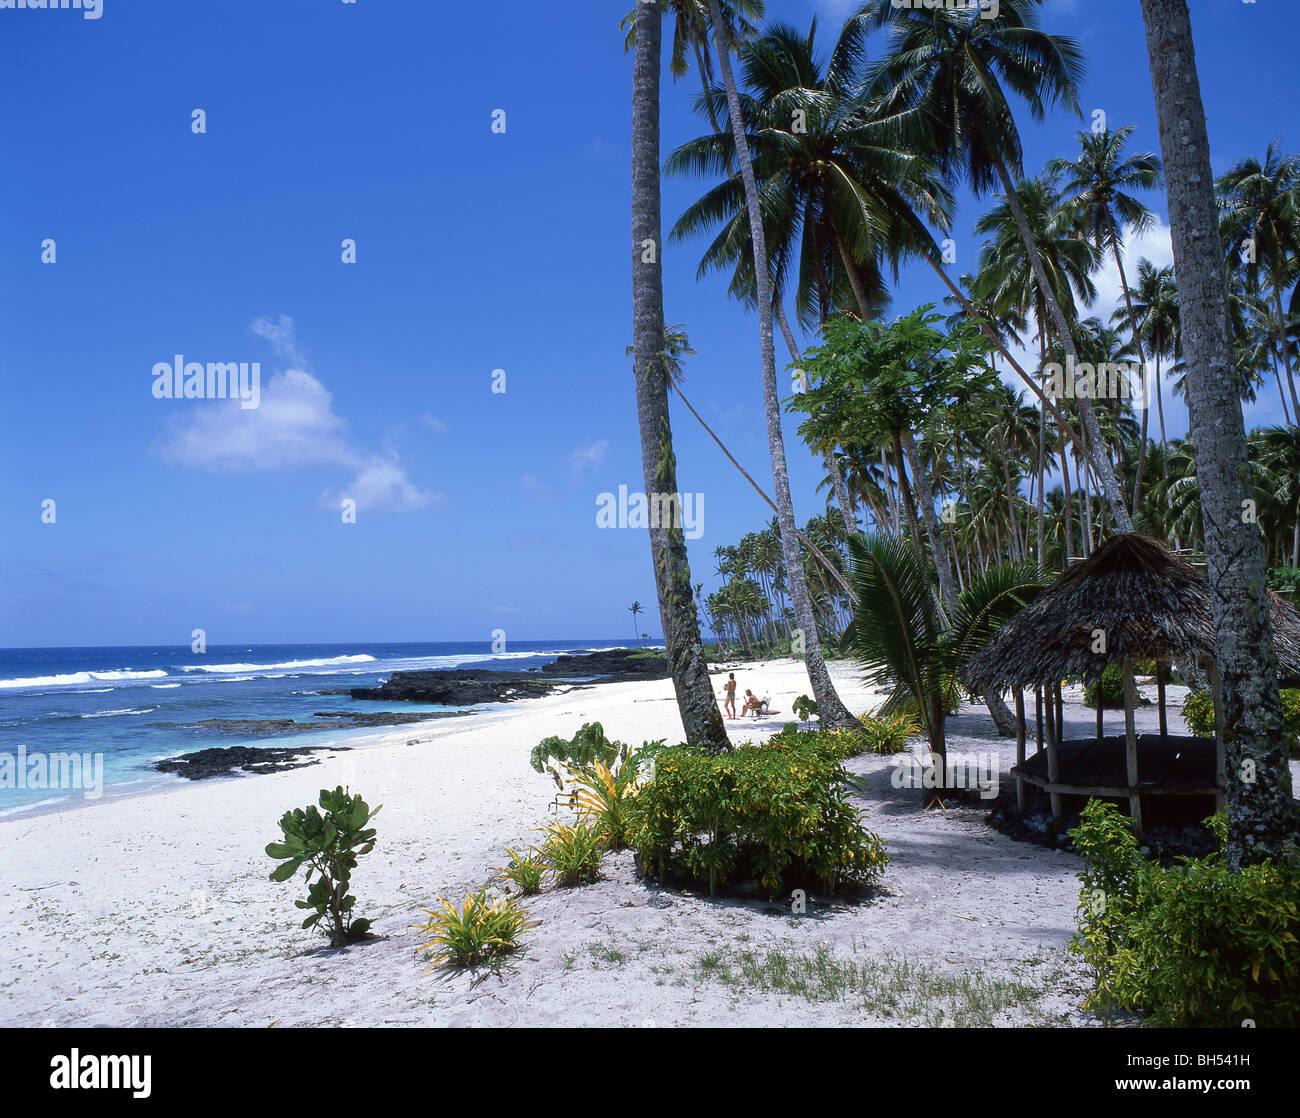 Samoa Beaches: 'Return To Paradise' Beach, Upolu, Western Samoa Stock